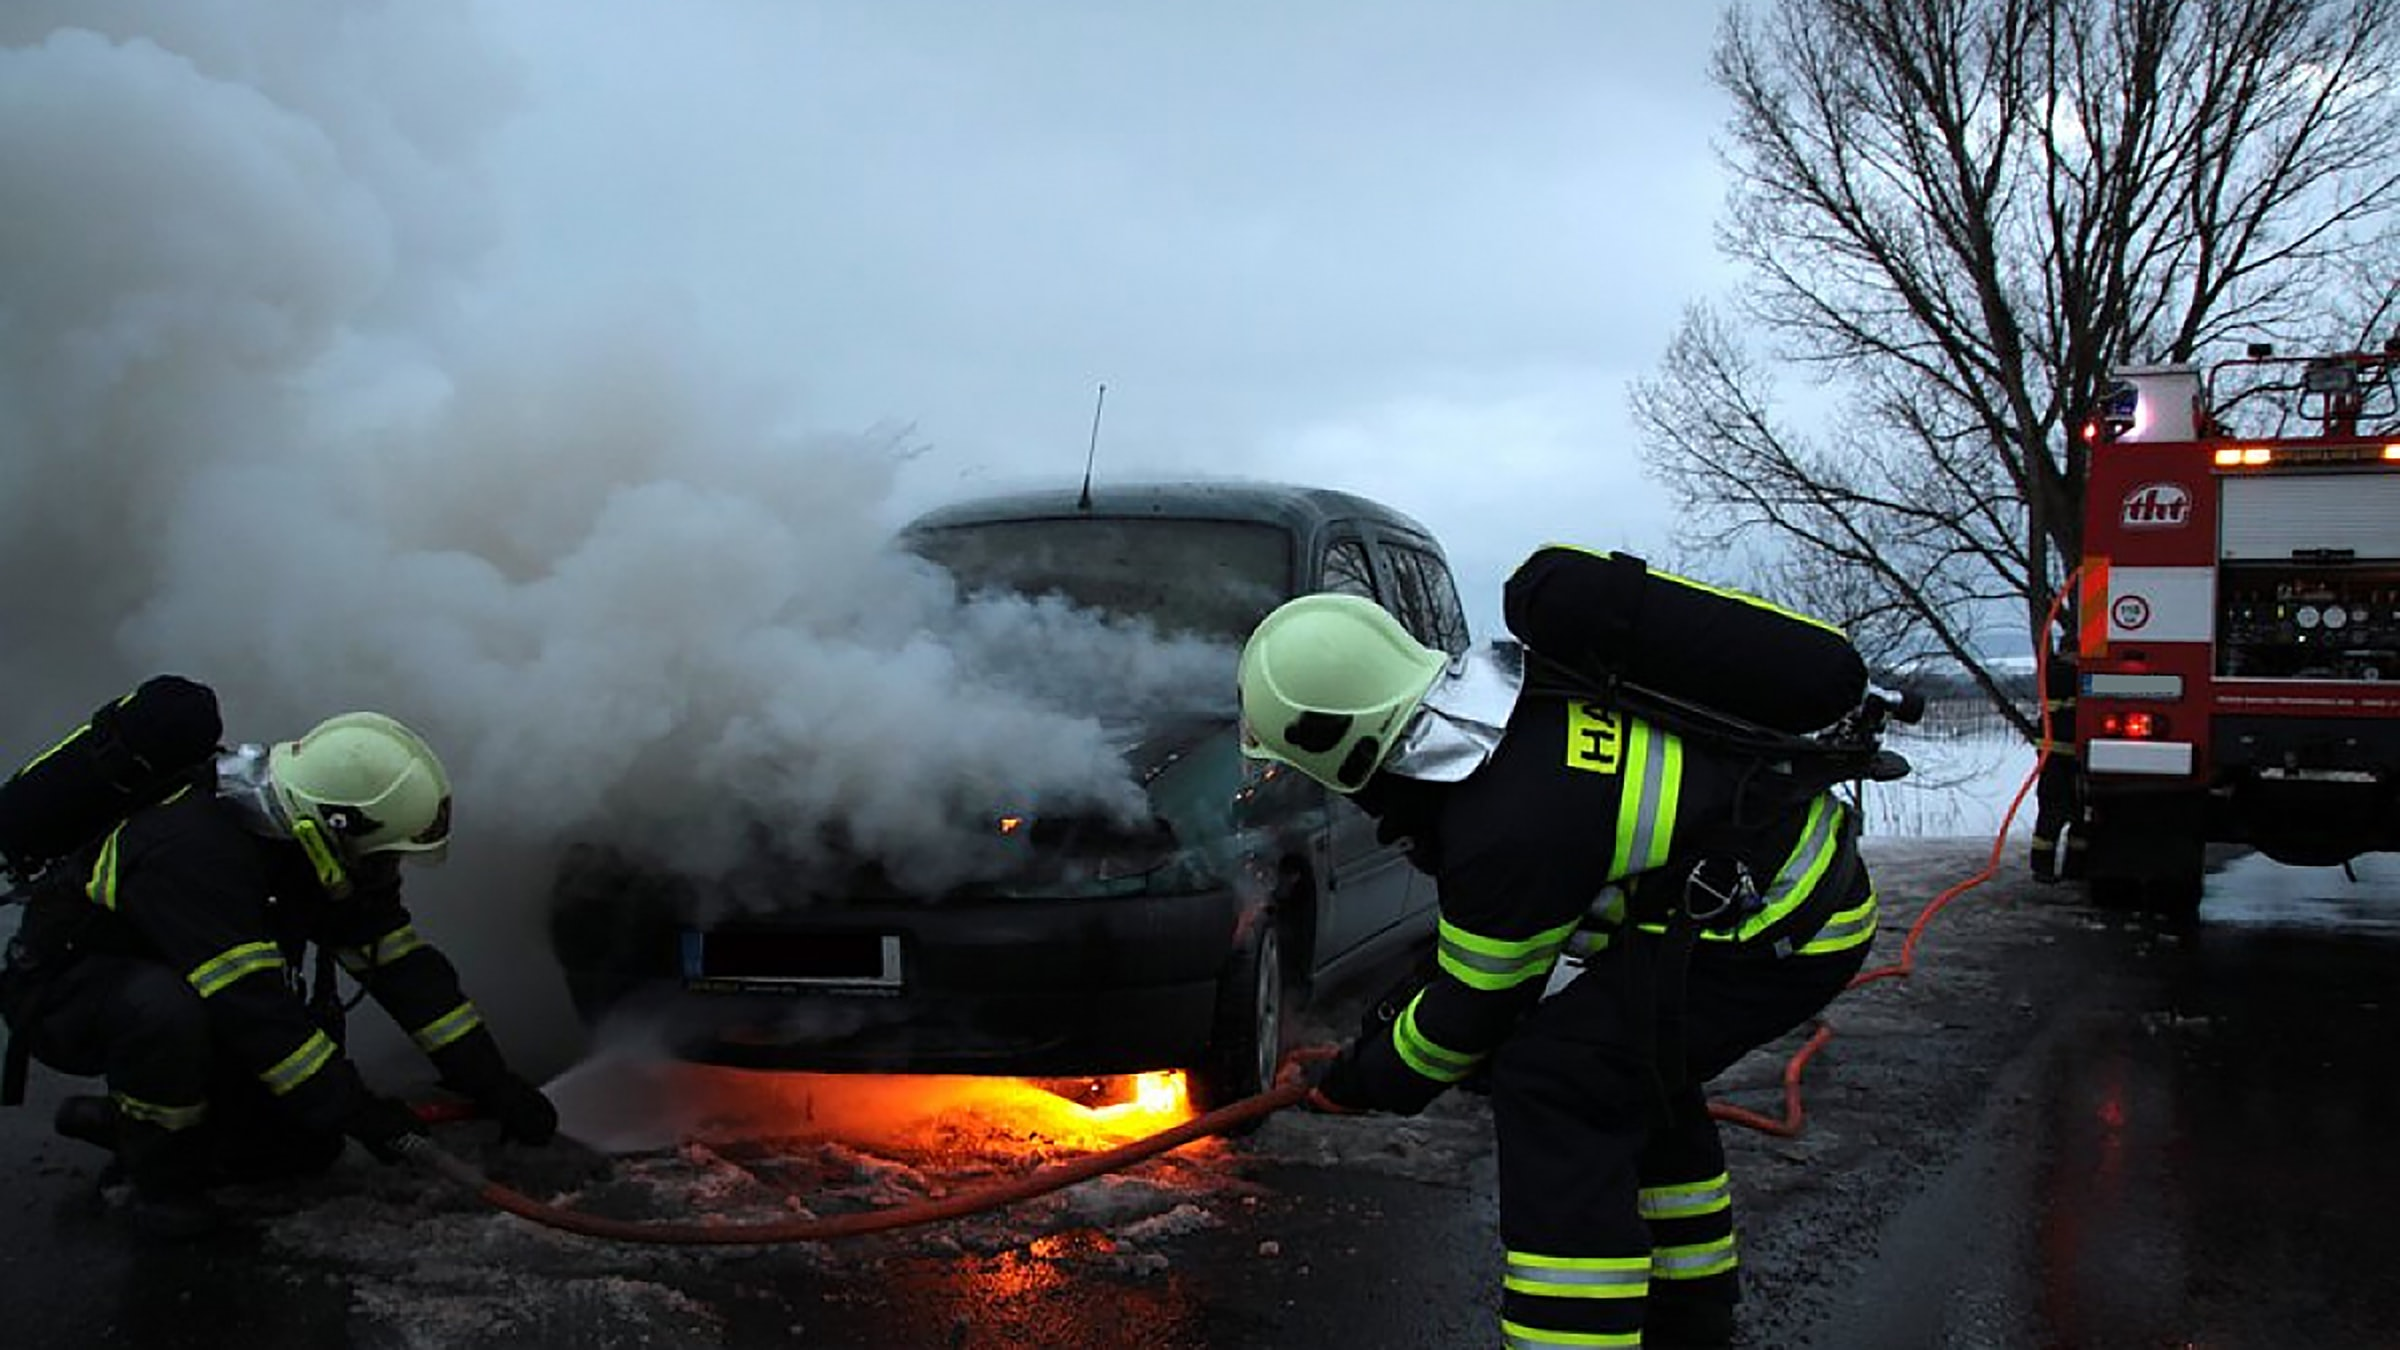 Fireman extinguishing a car fire